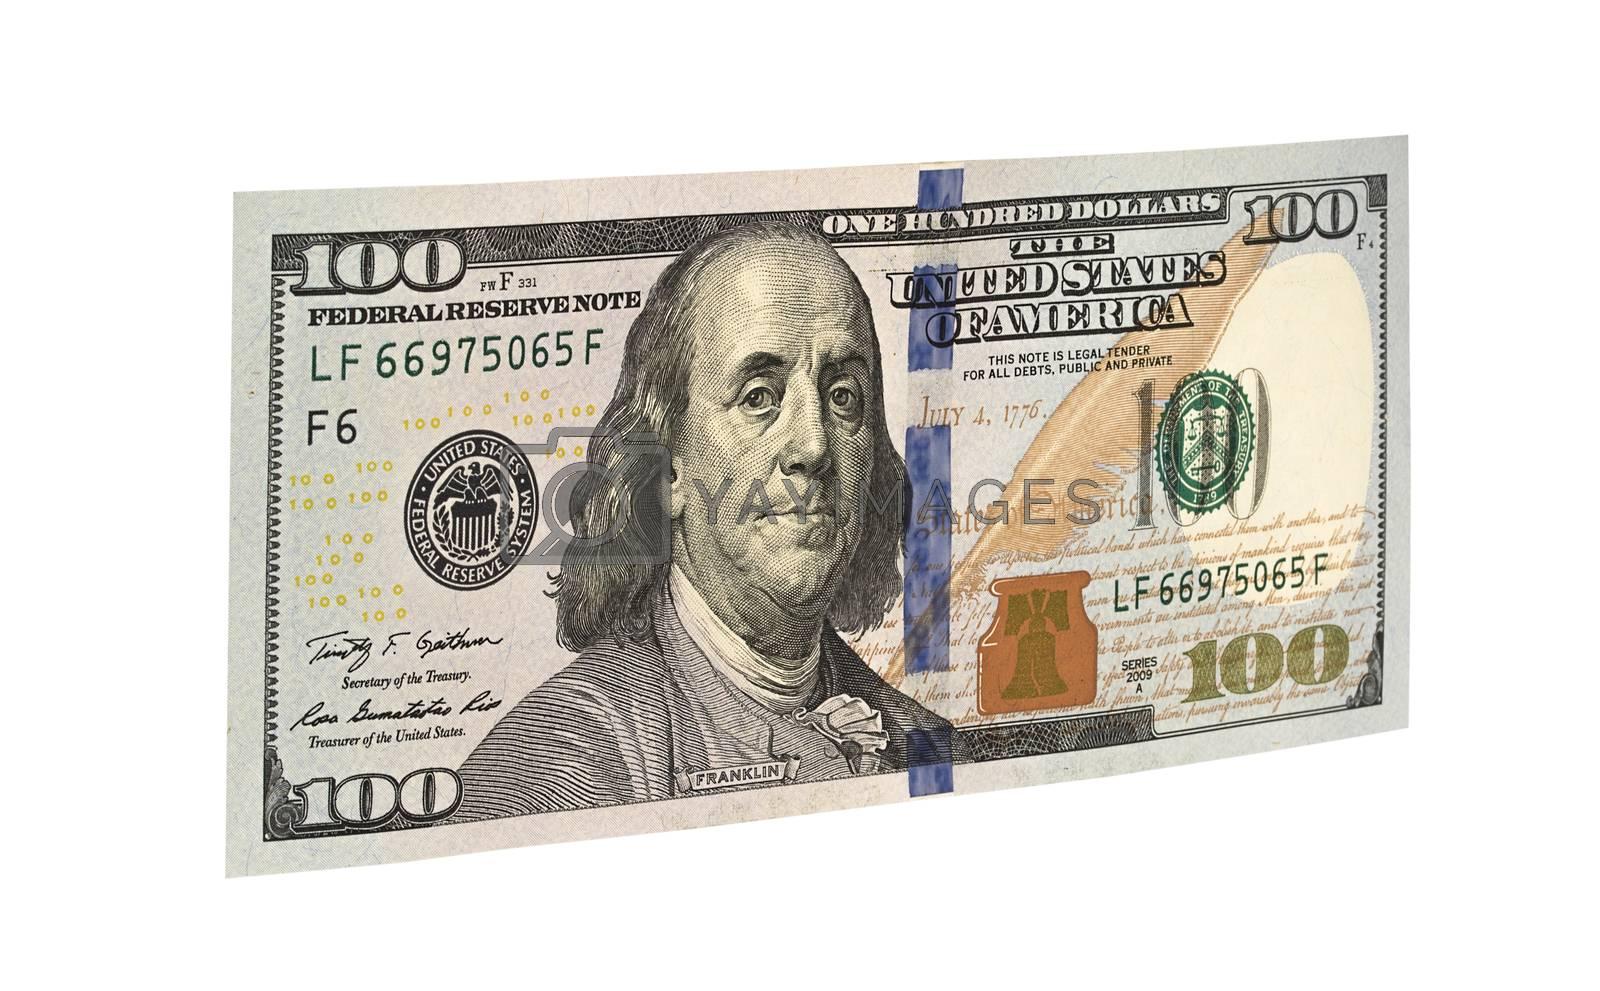 100 american dollars. American money isolated